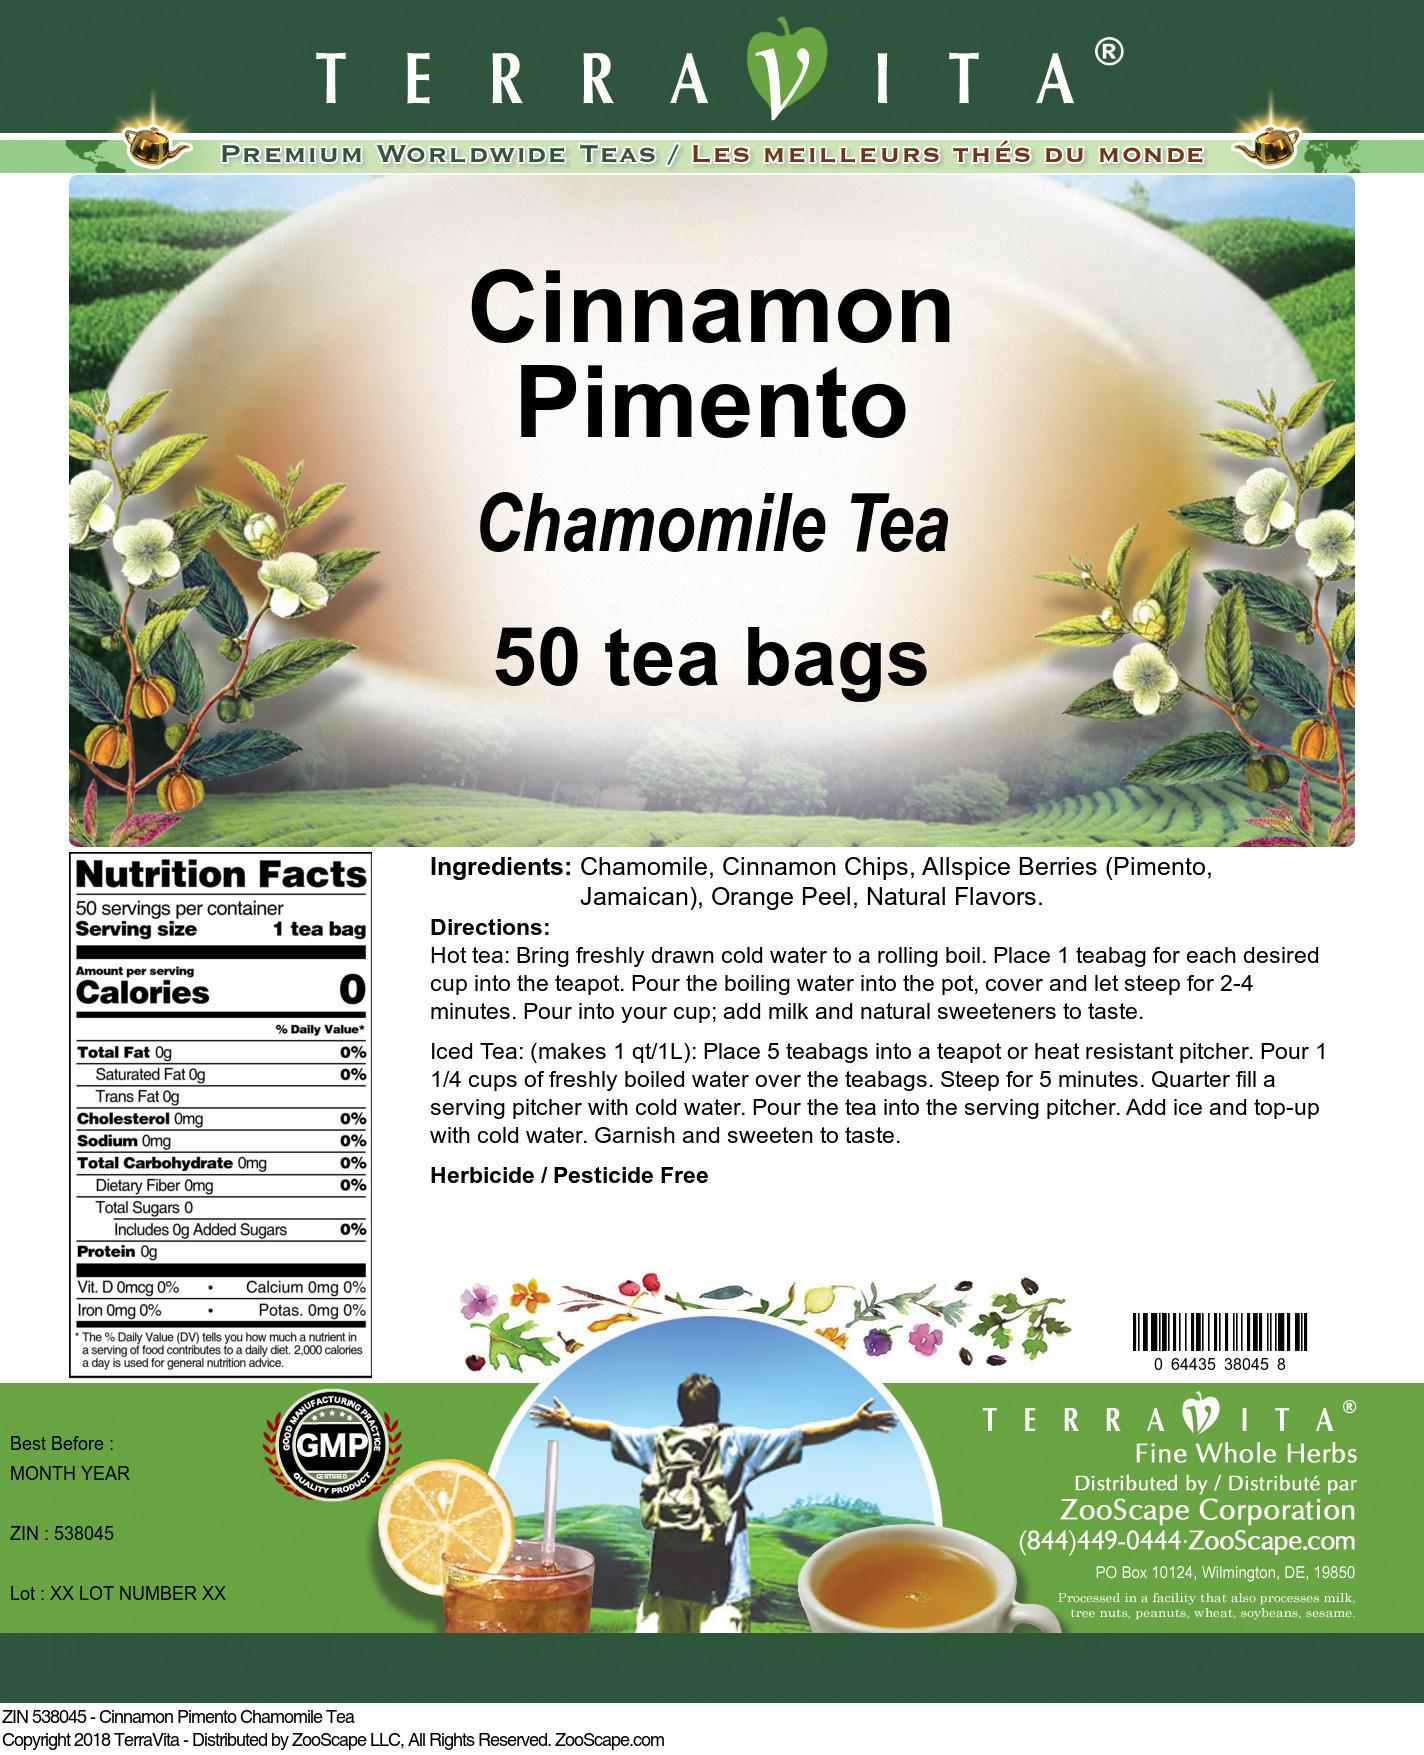 Cinnamon Pimento Chamomile Tea